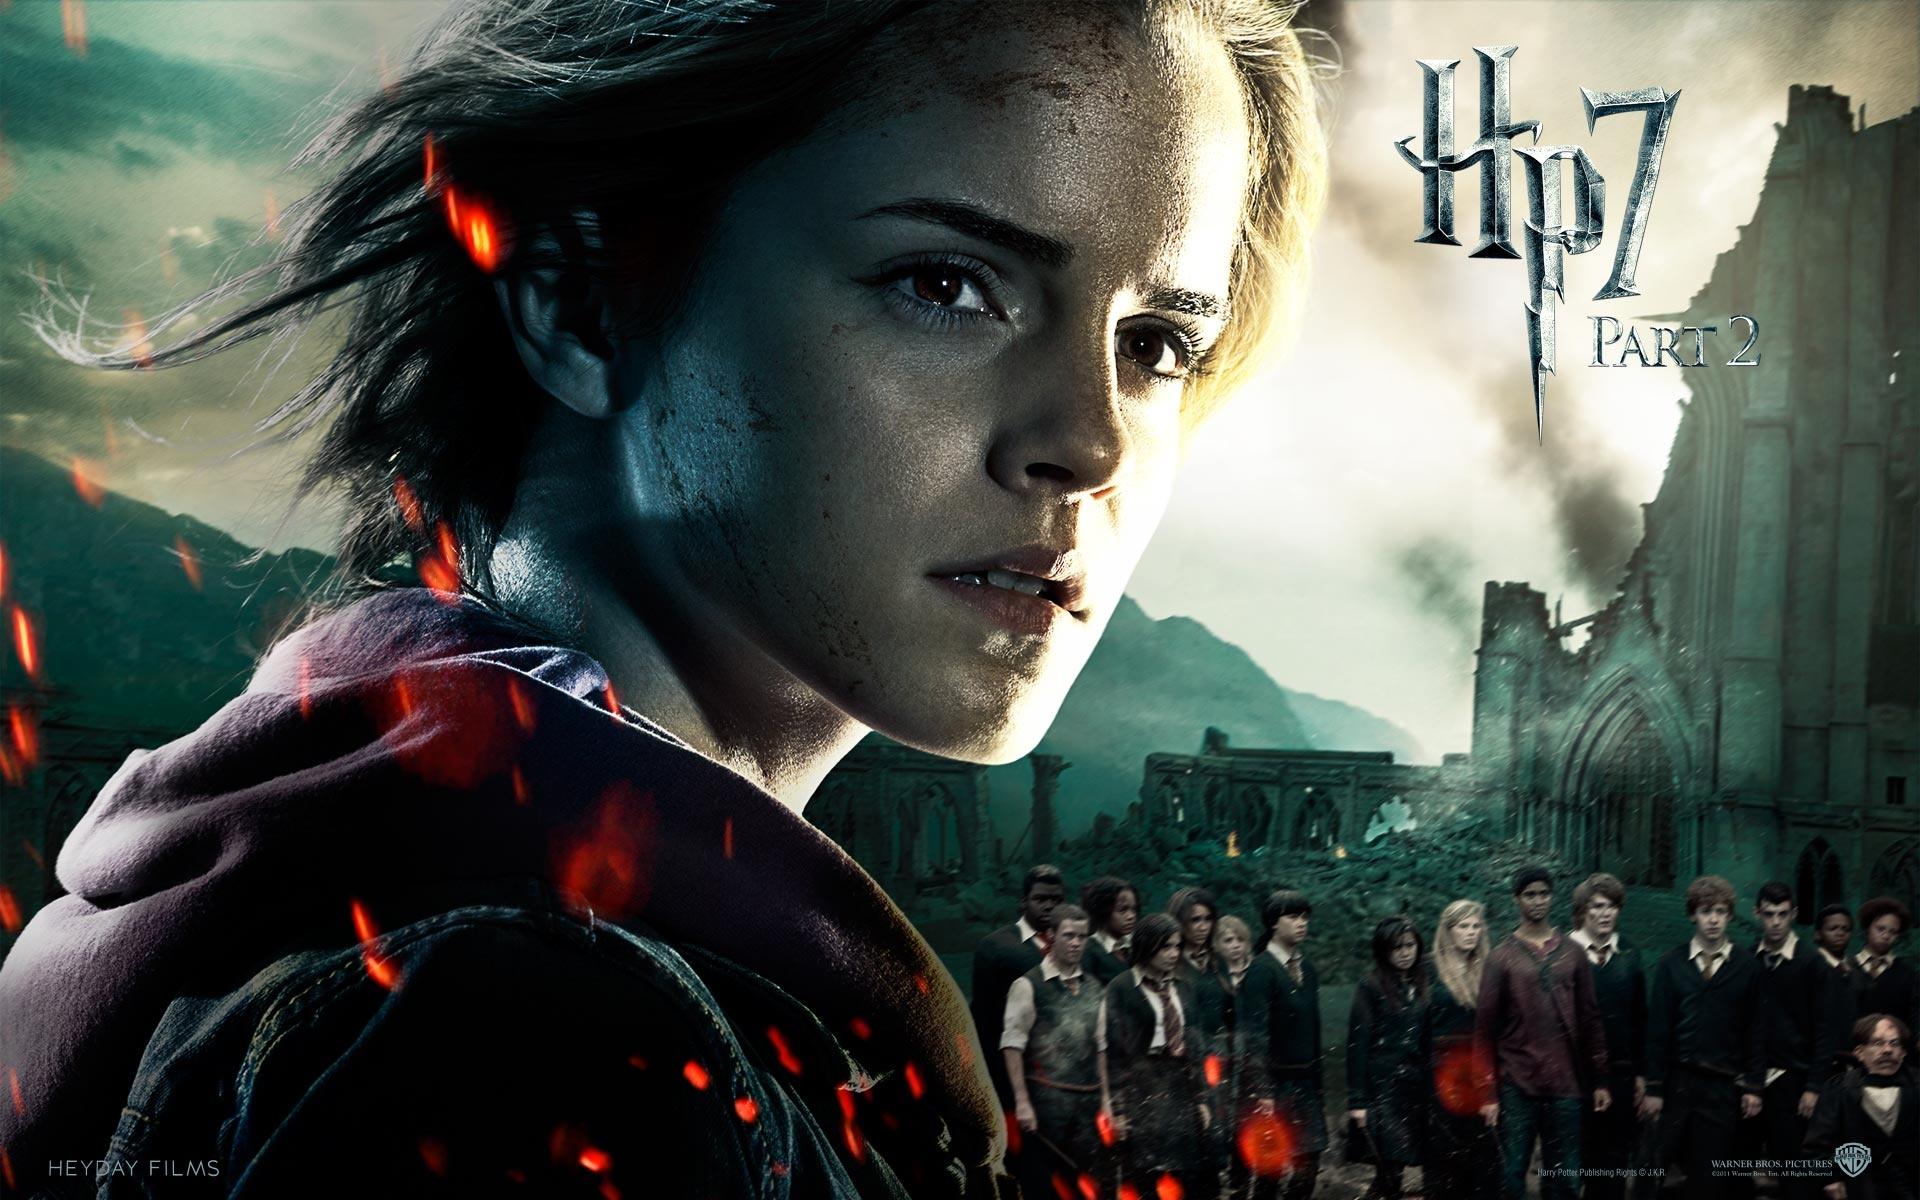 Emma Watson In HP7 Part 2 Wallpapers In Jpg Format For